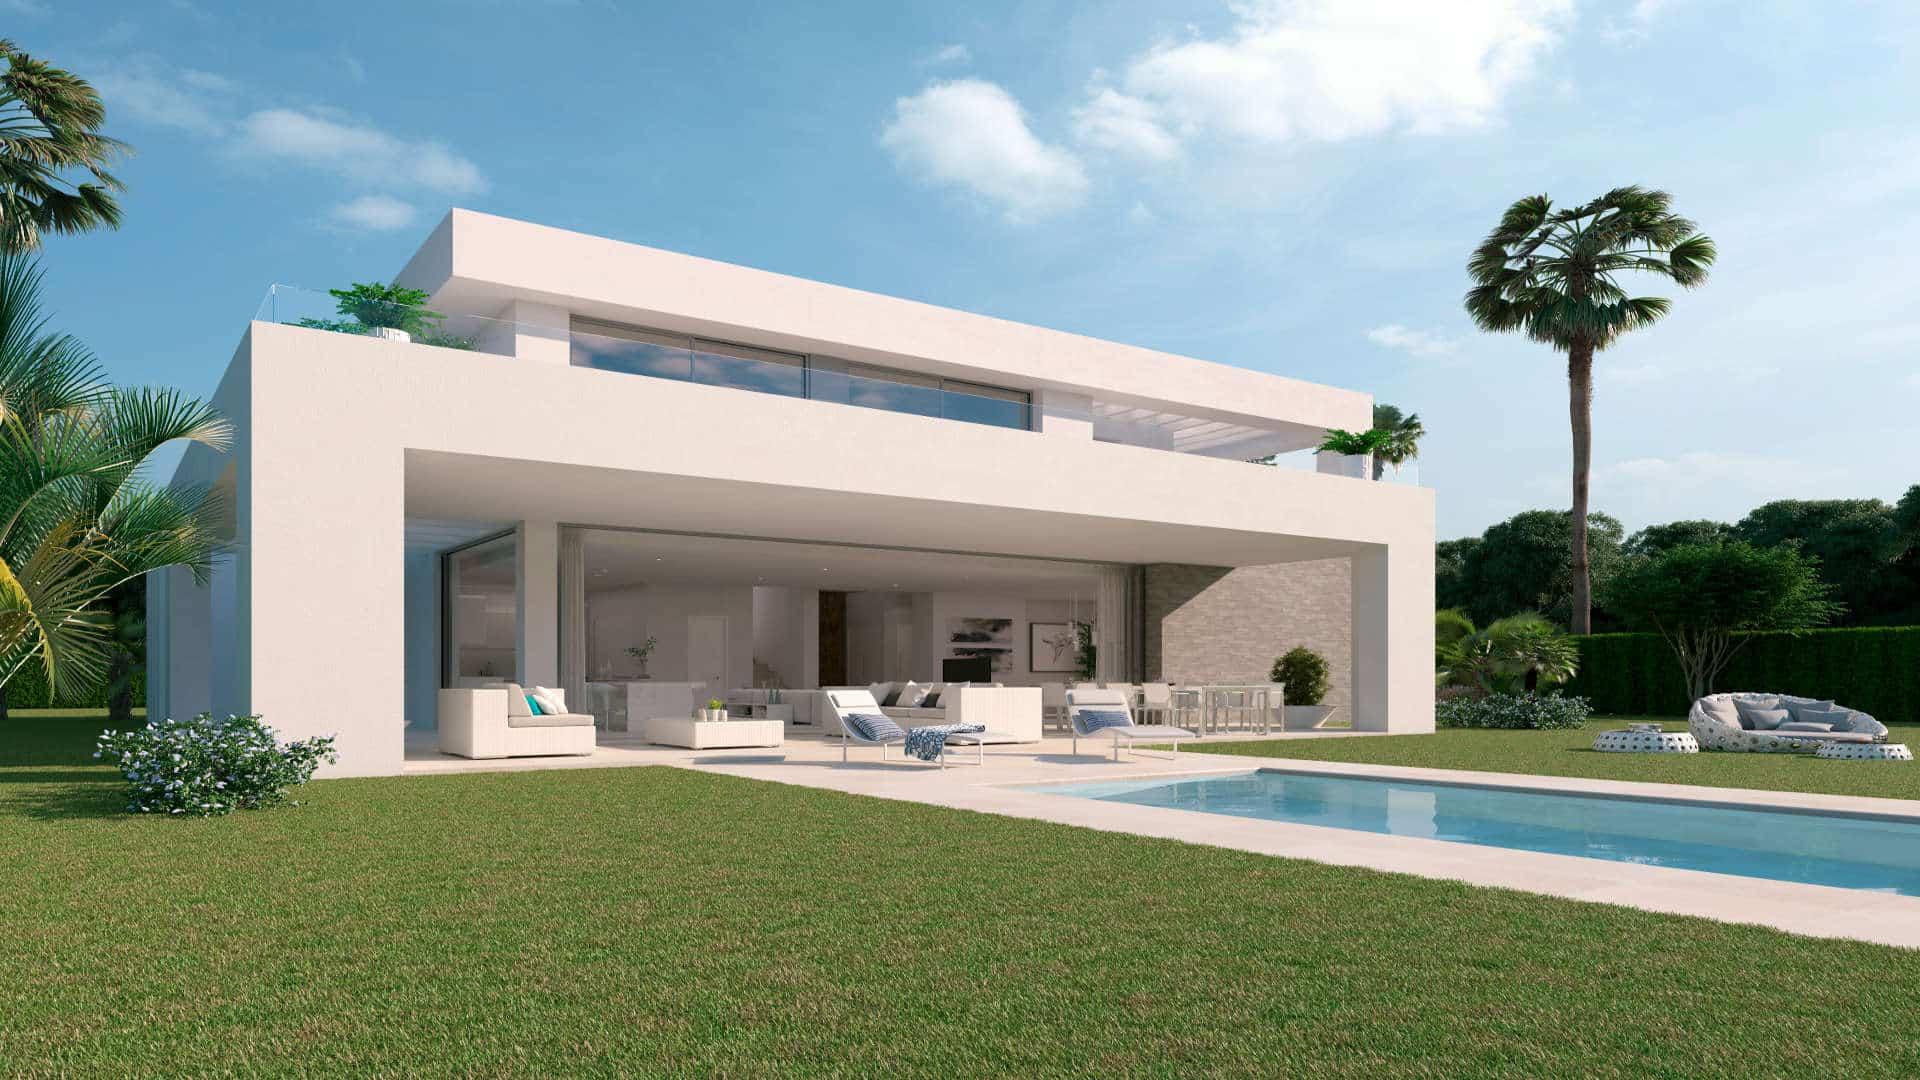 Moderne 4 slaapkamer Morera villa te koop – nieuwbouwproject La Finca de La Cala